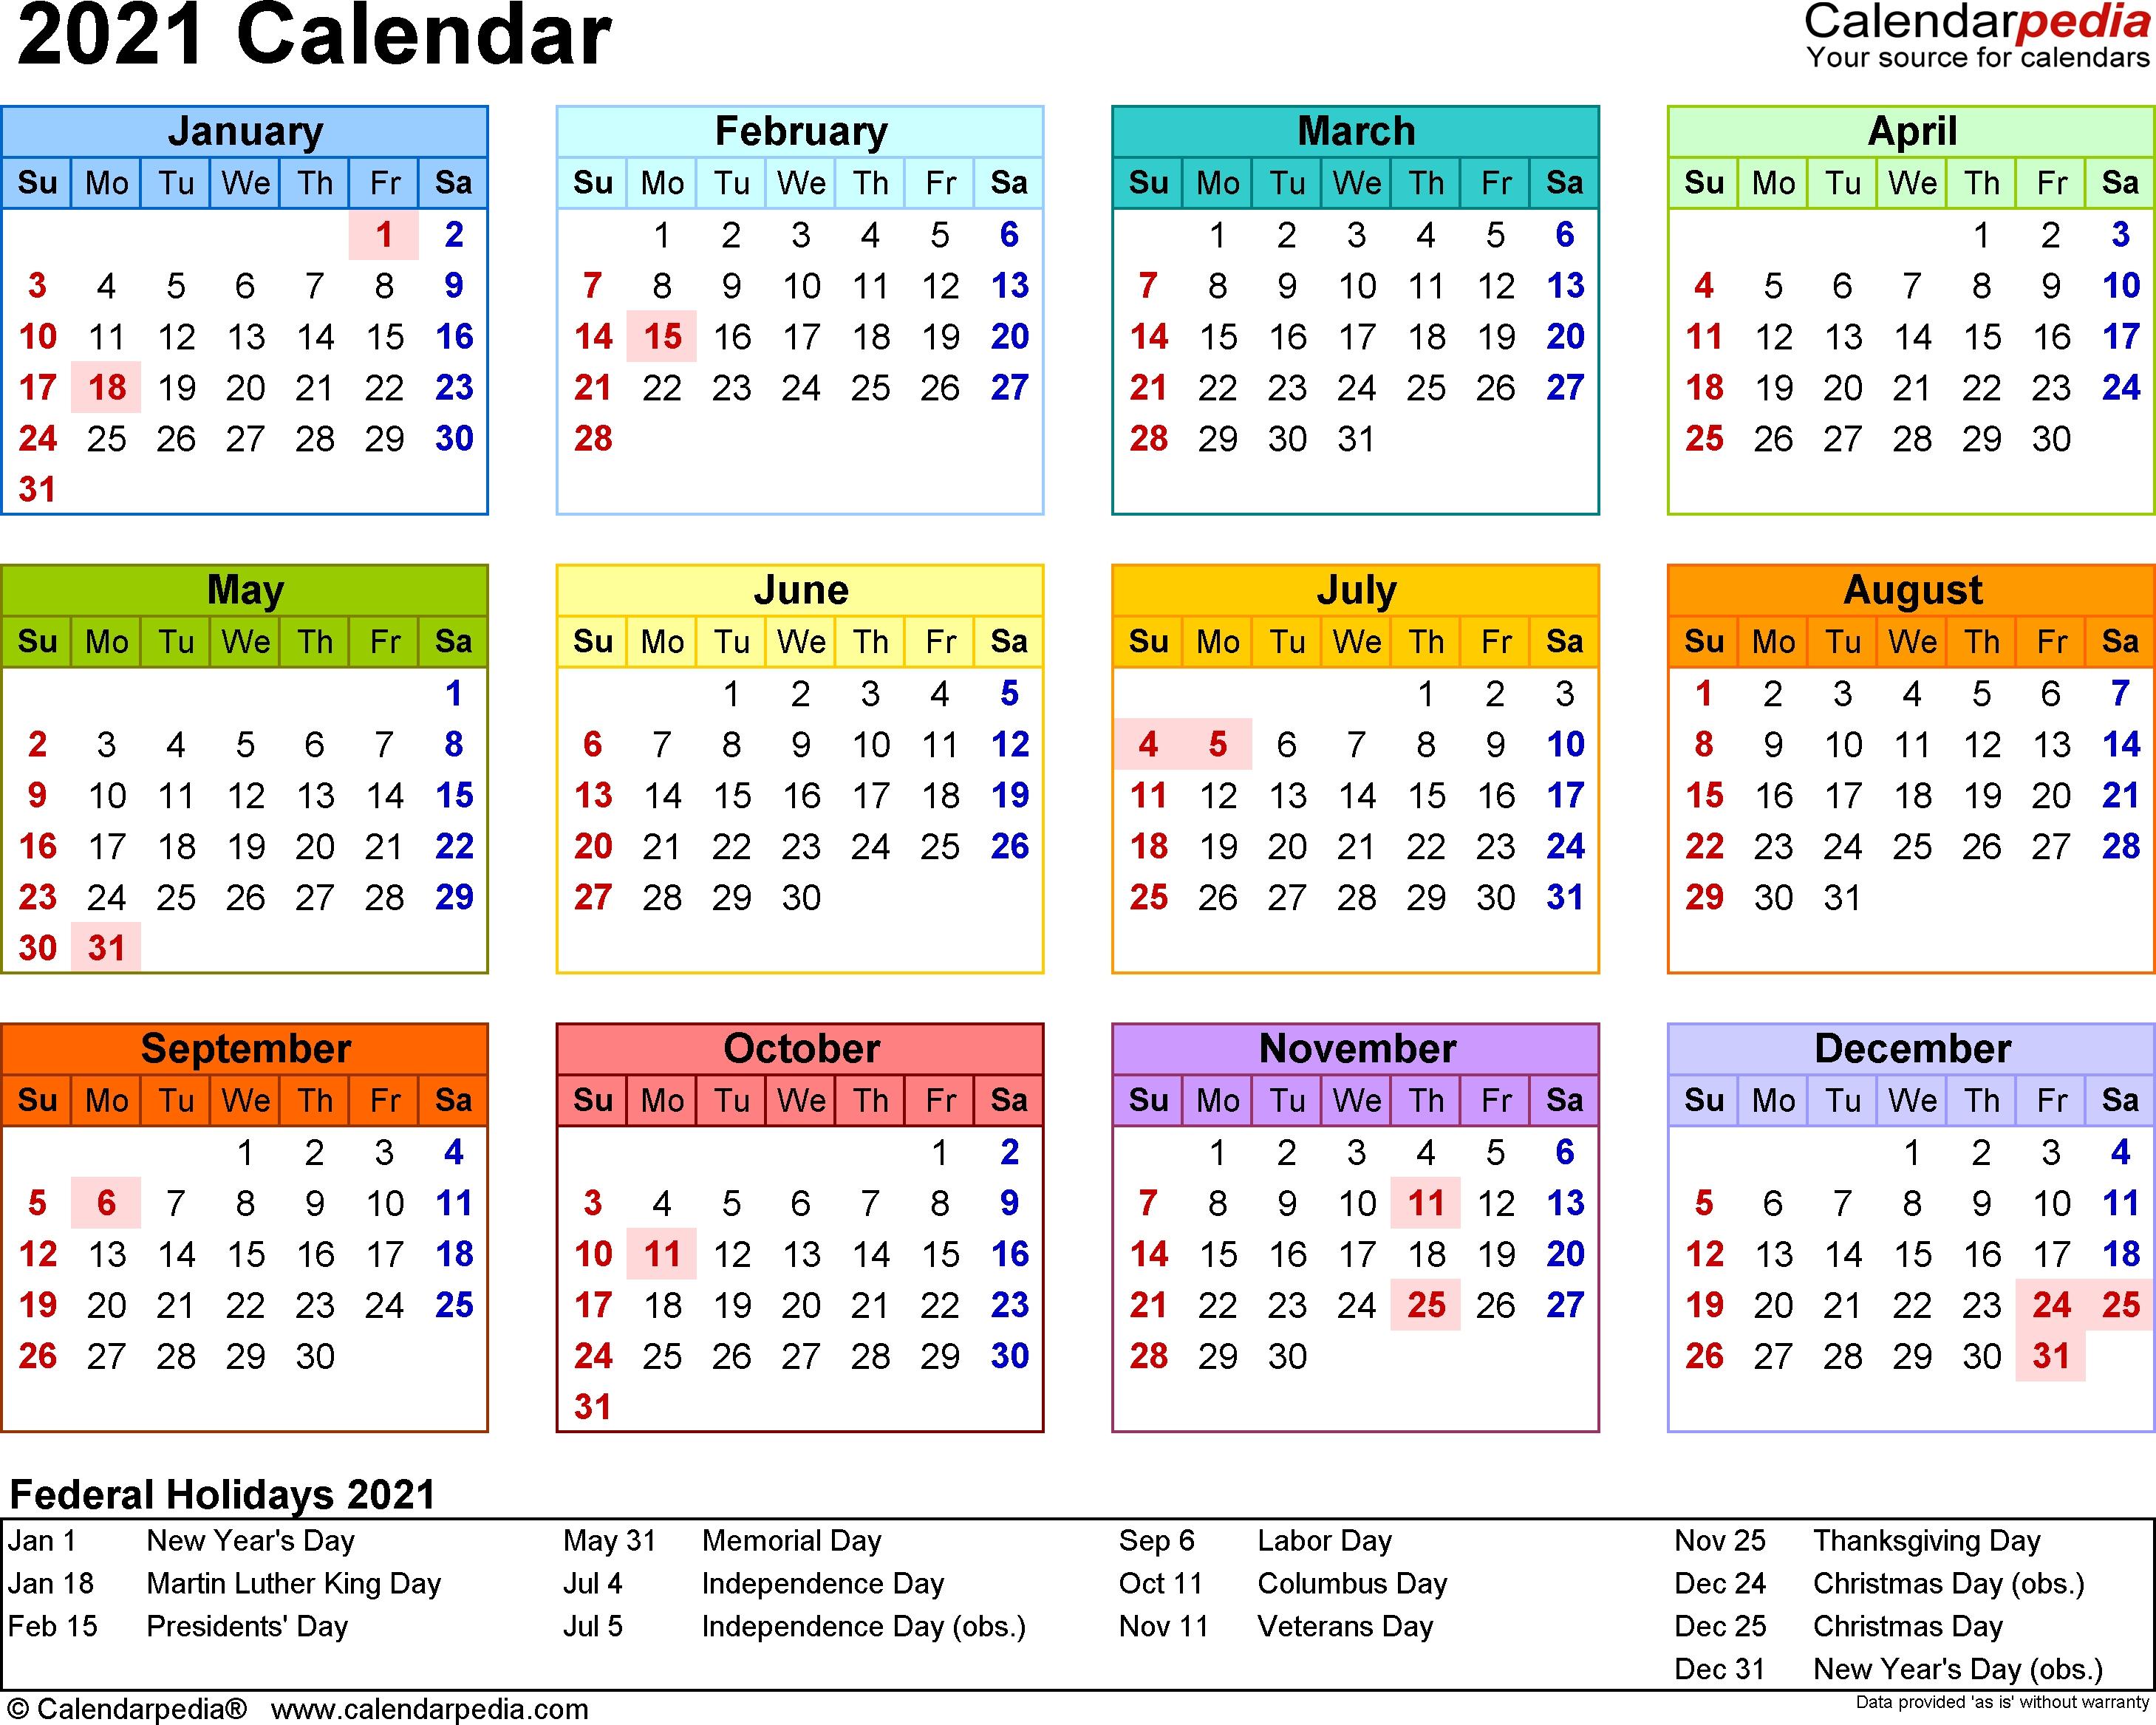 Free 2021 yearly calendar template service. Year Calendar For 2021 | Month Calendar Printable